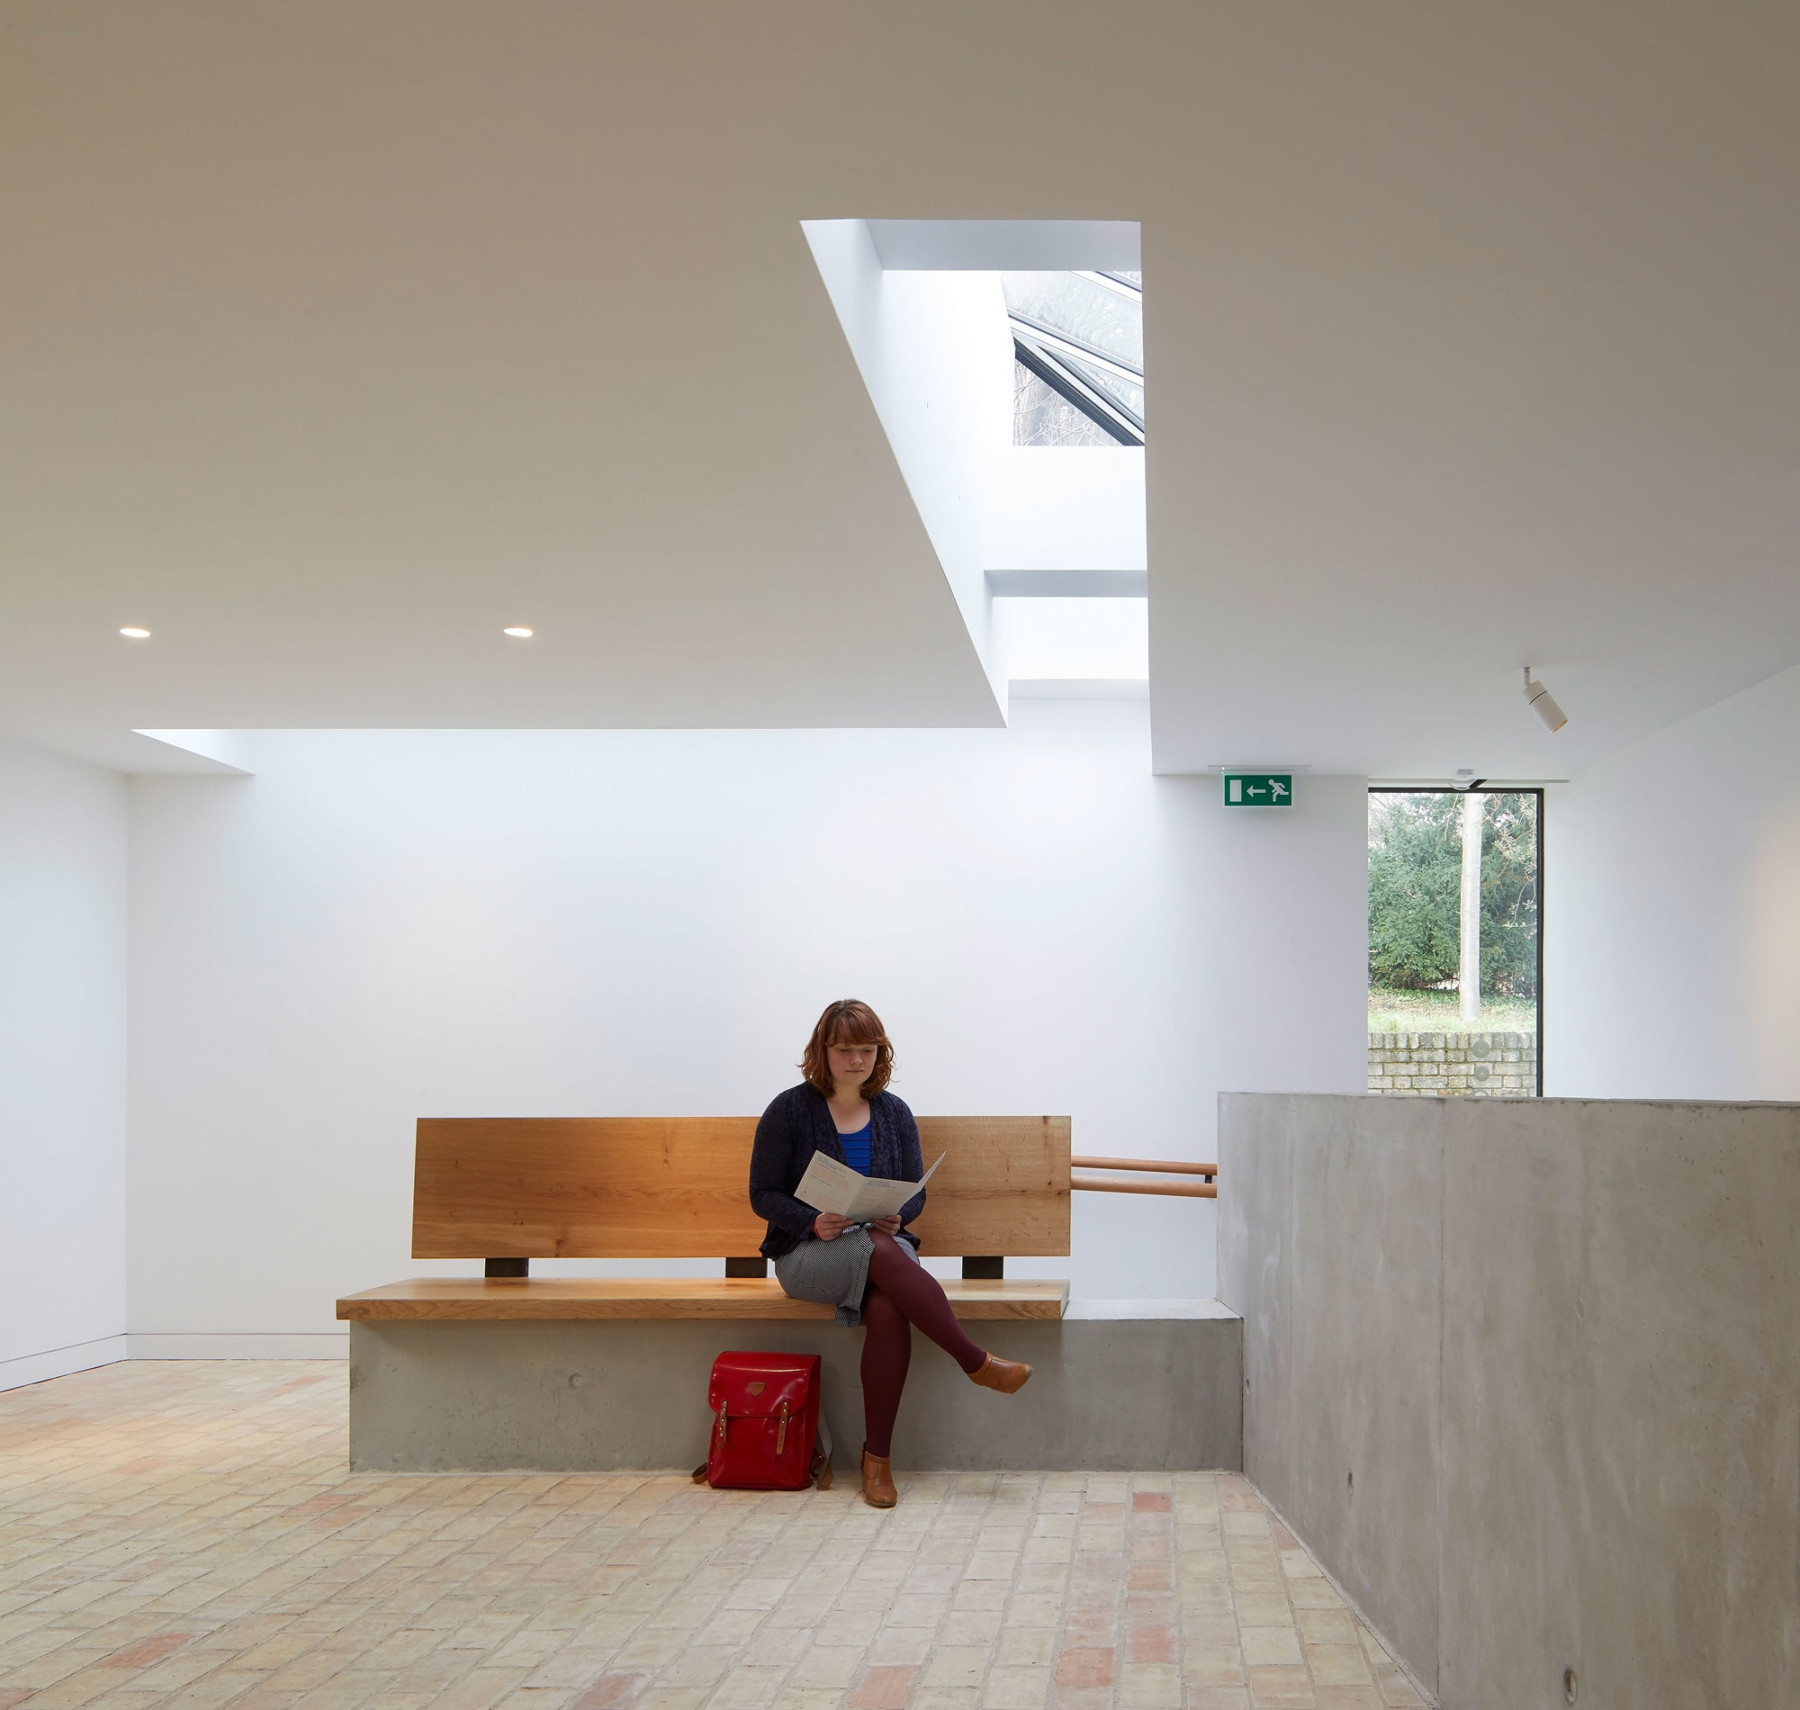 Jamie-Fobert-Architects Kettle's-Yard Cambridge Hufton+Crow 023